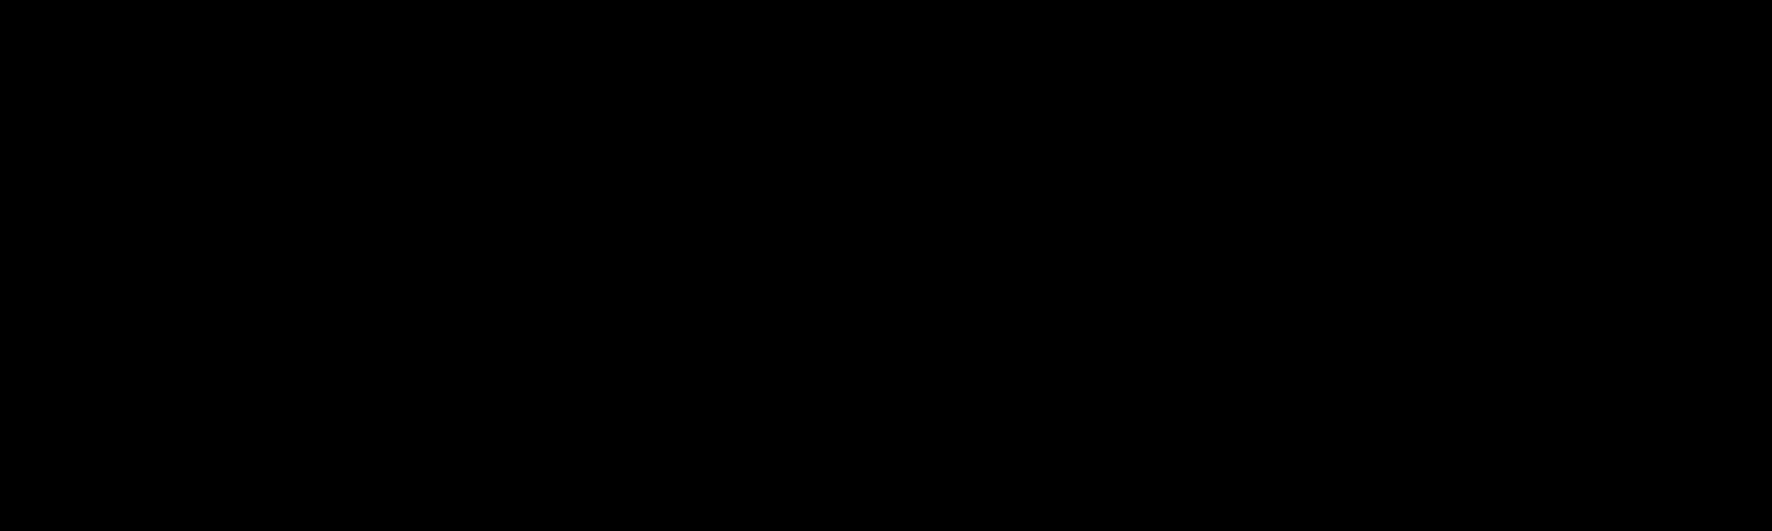 Paridaans bandendruksystemen